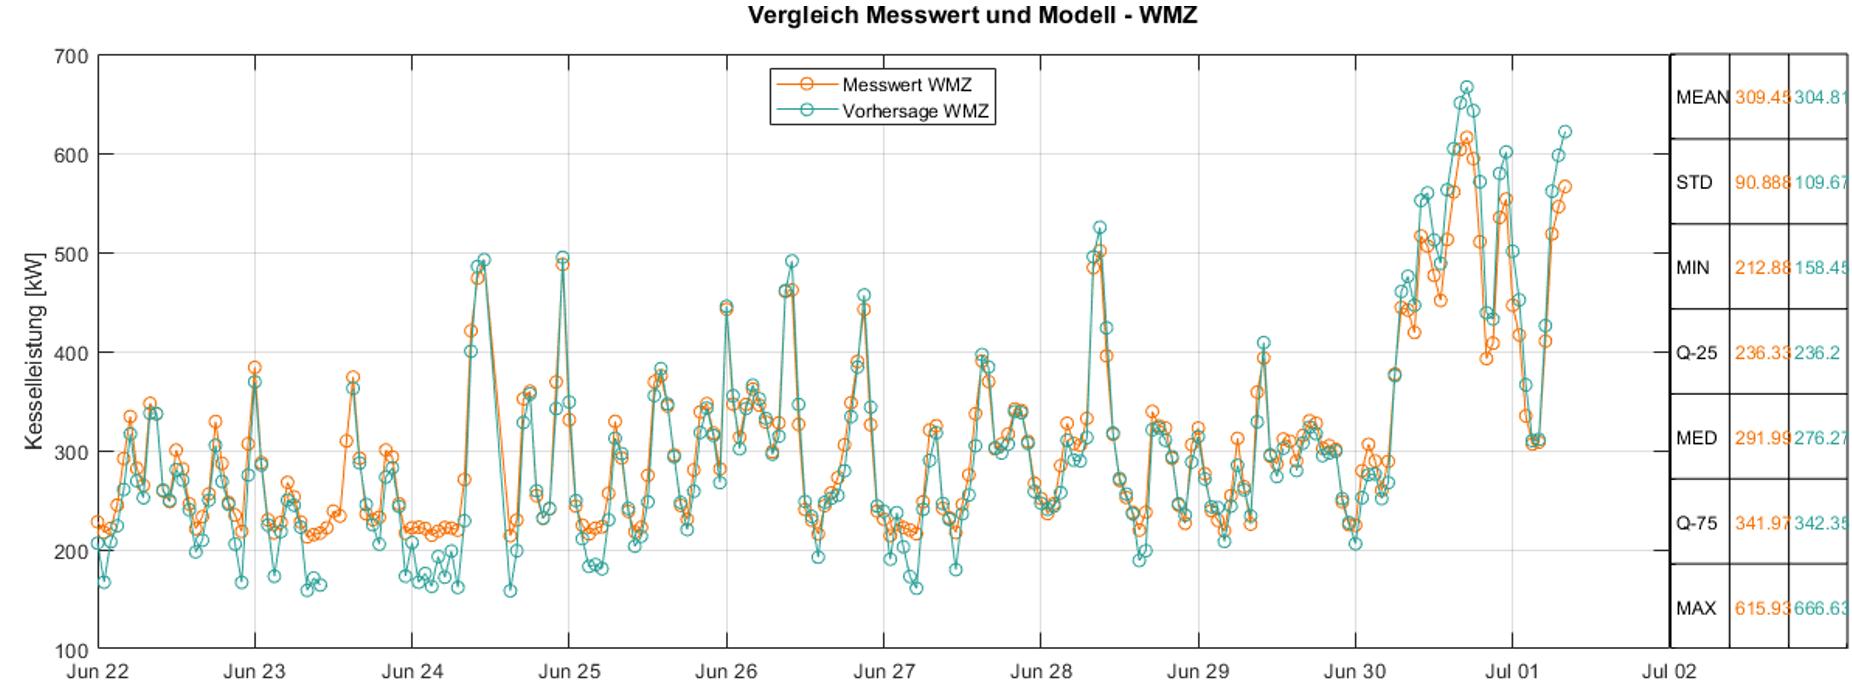 Performance des WMZ-Regressionsmodells